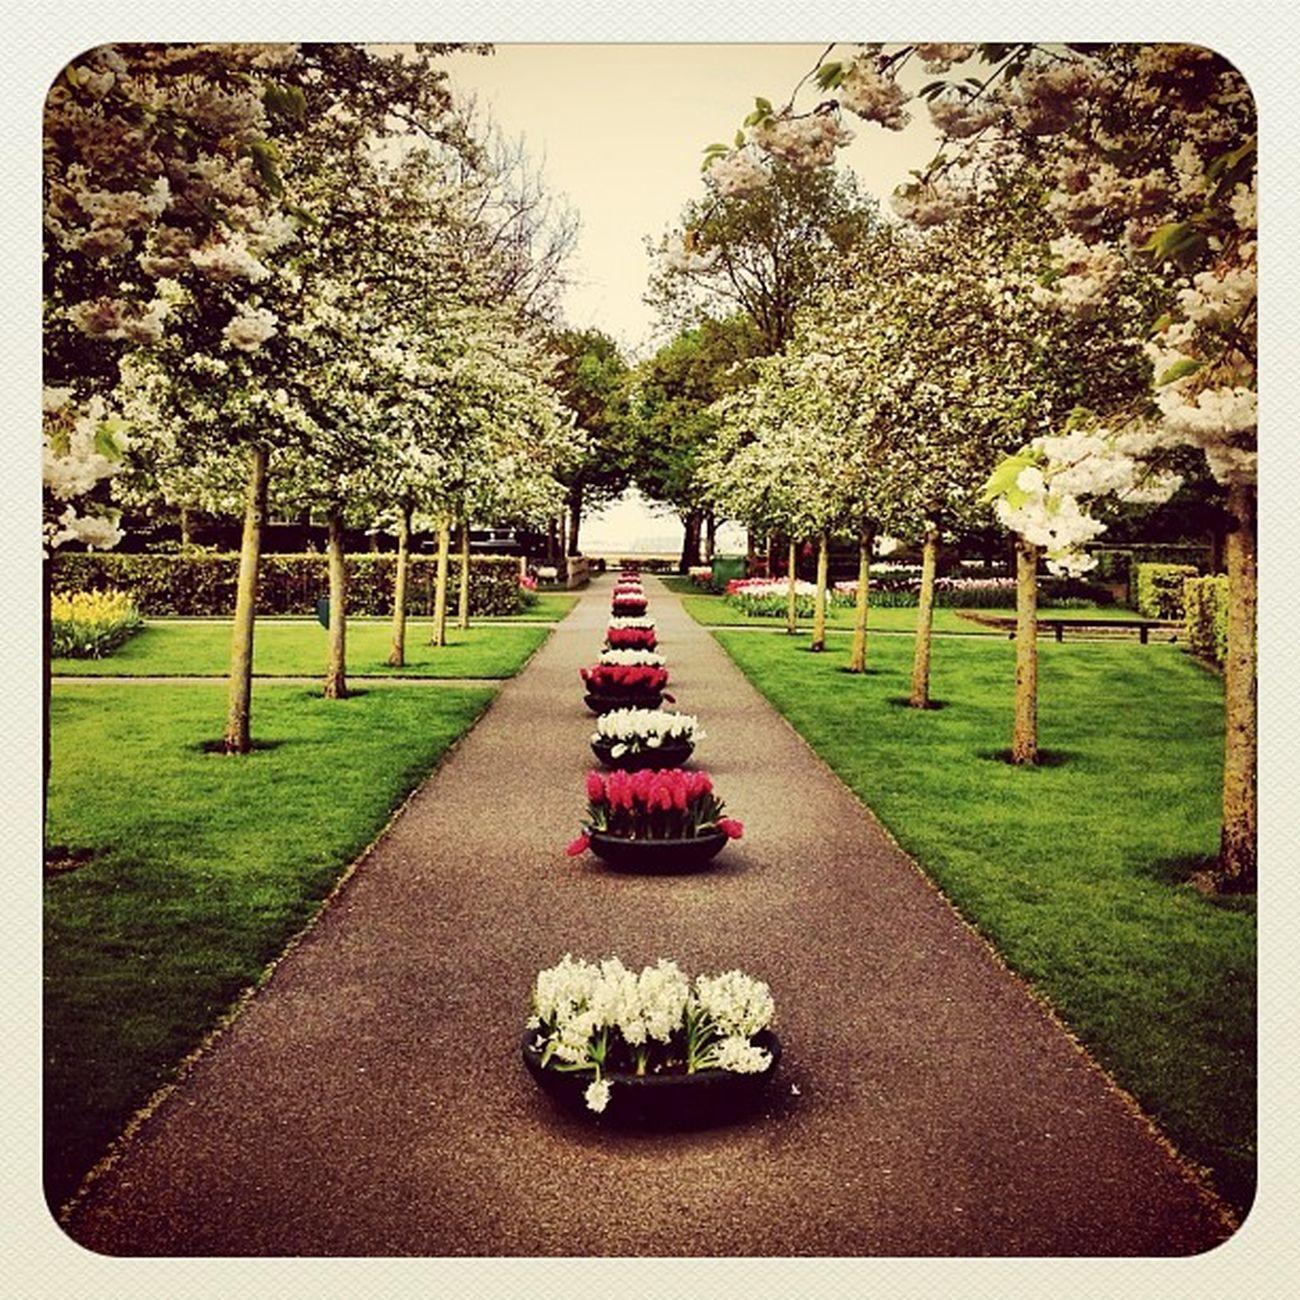 Blooming In #keukenhof #holland #jj_forum #earlybirdlove #ubiquography #ebstyles_gf #flower #park #garden Garden Flower Holland Park Keukenhof Earlybirdlove Jj_forum Ubiquography Ebstyles_gf